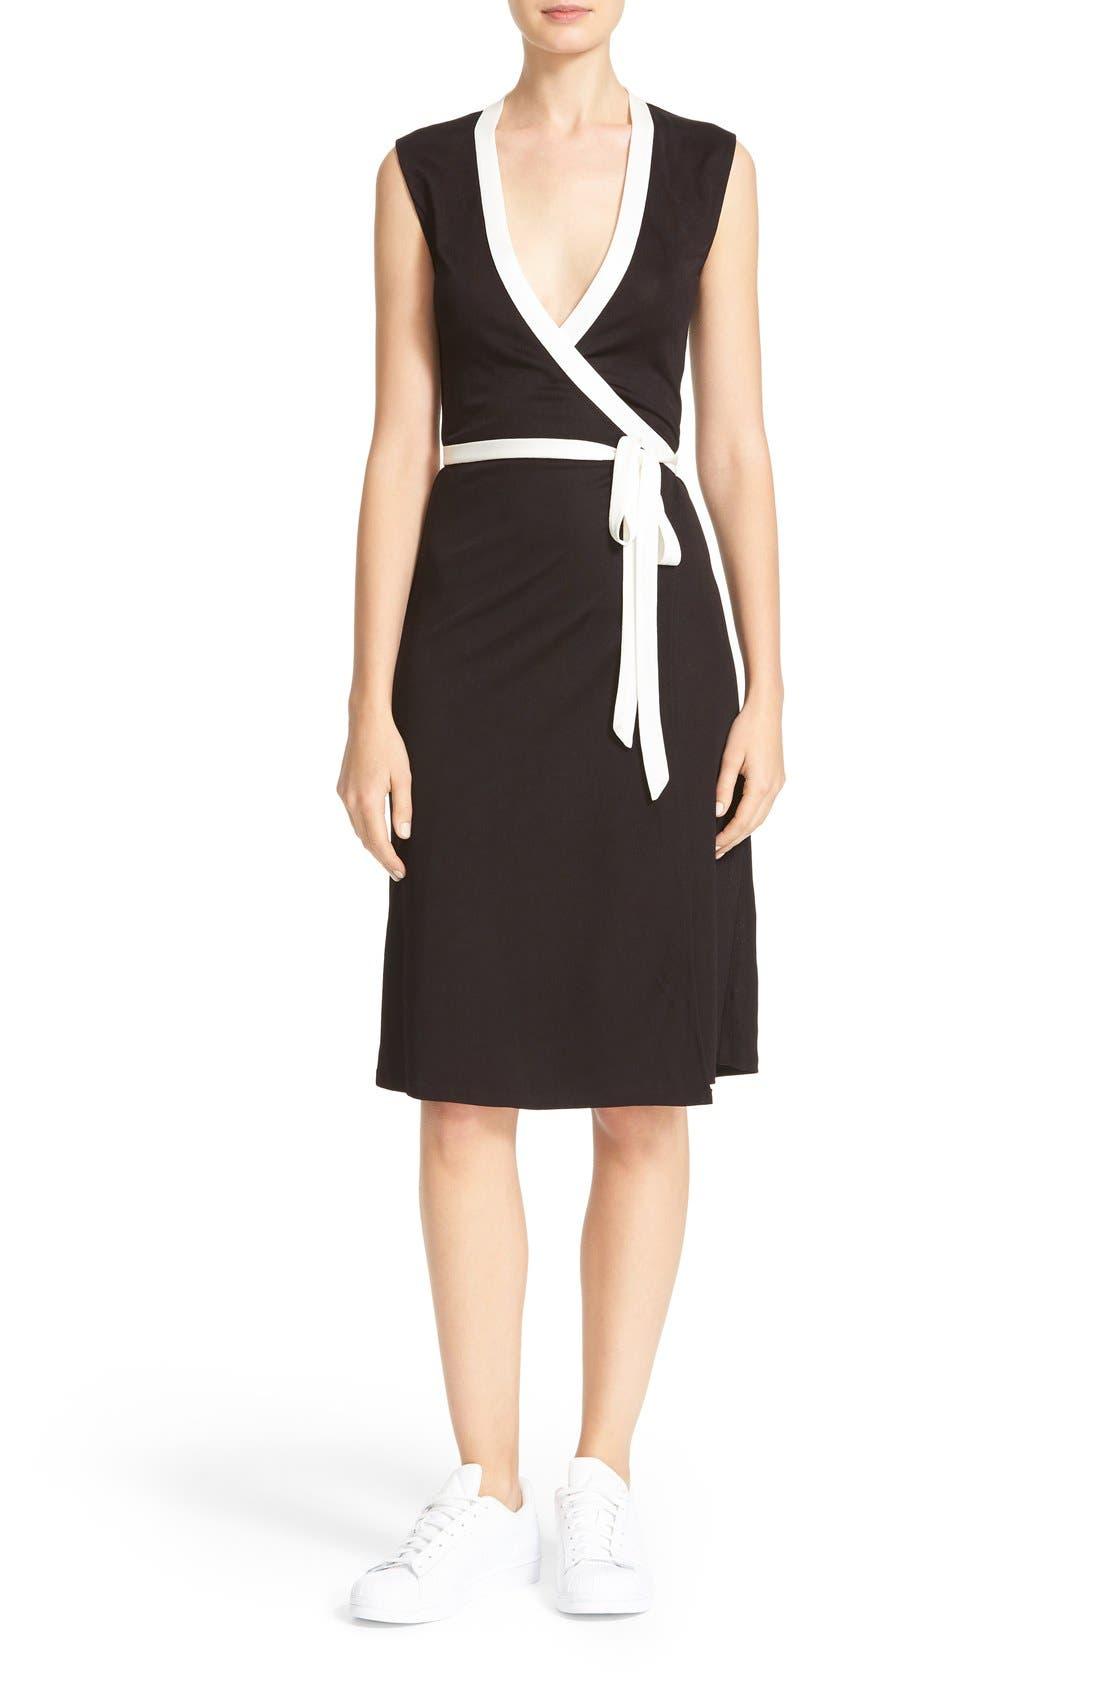 Alternate Image 1 Selected - Diane von Furstenberg Valena Wrap Dress